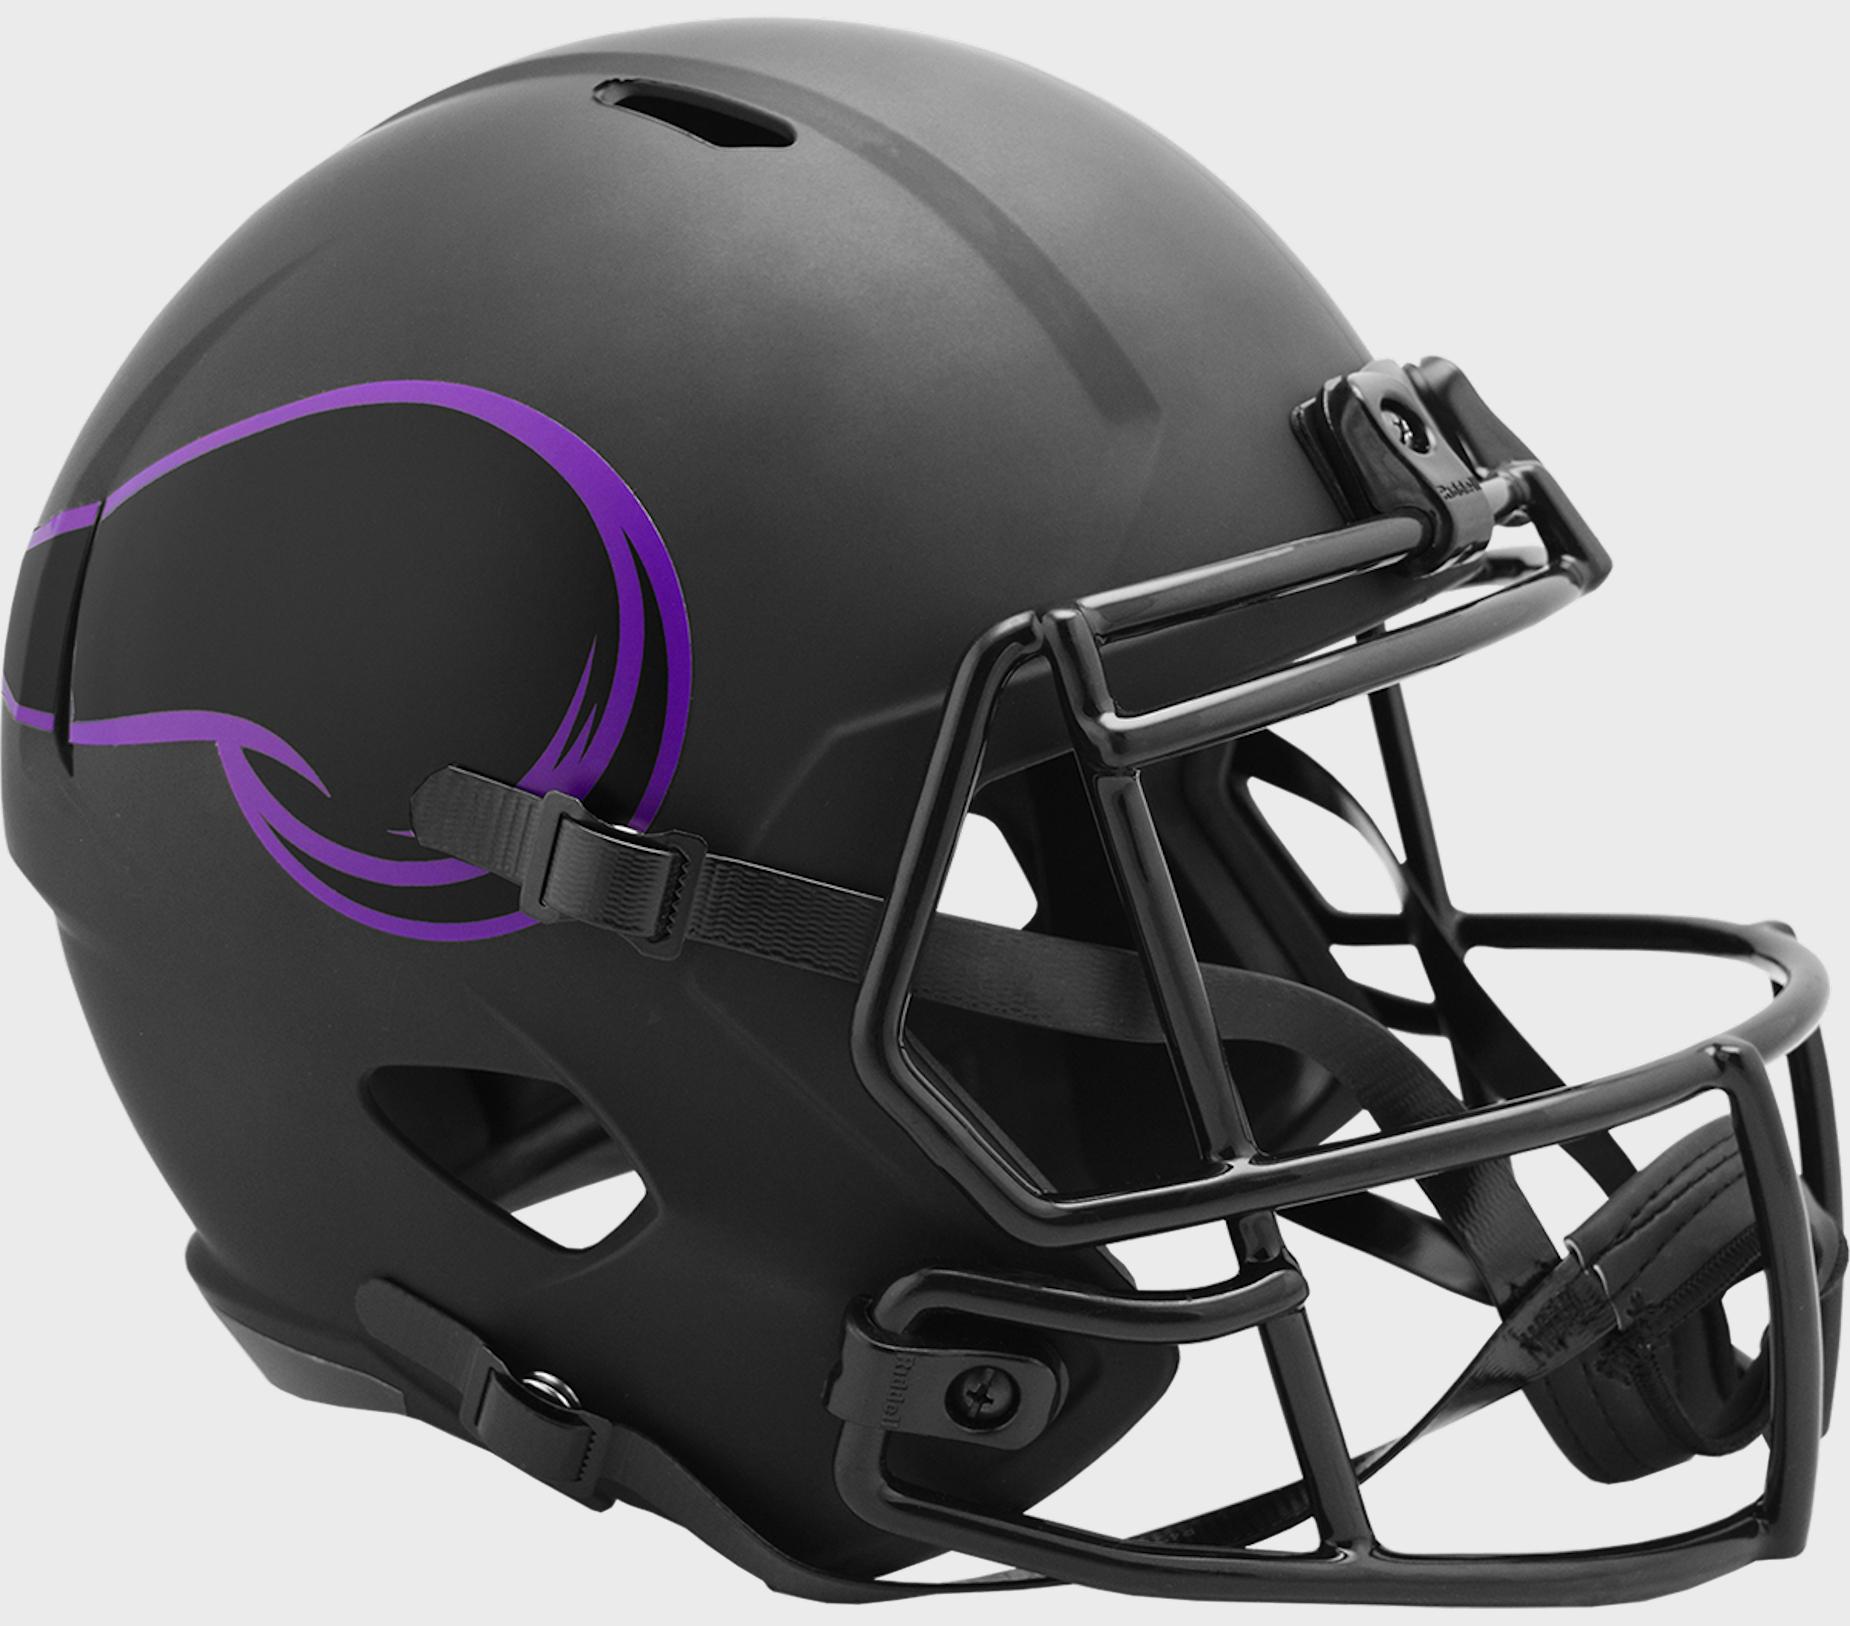 Minnesota Vikings Speed Replica Football Helmet <B>ECLIPSE</B>